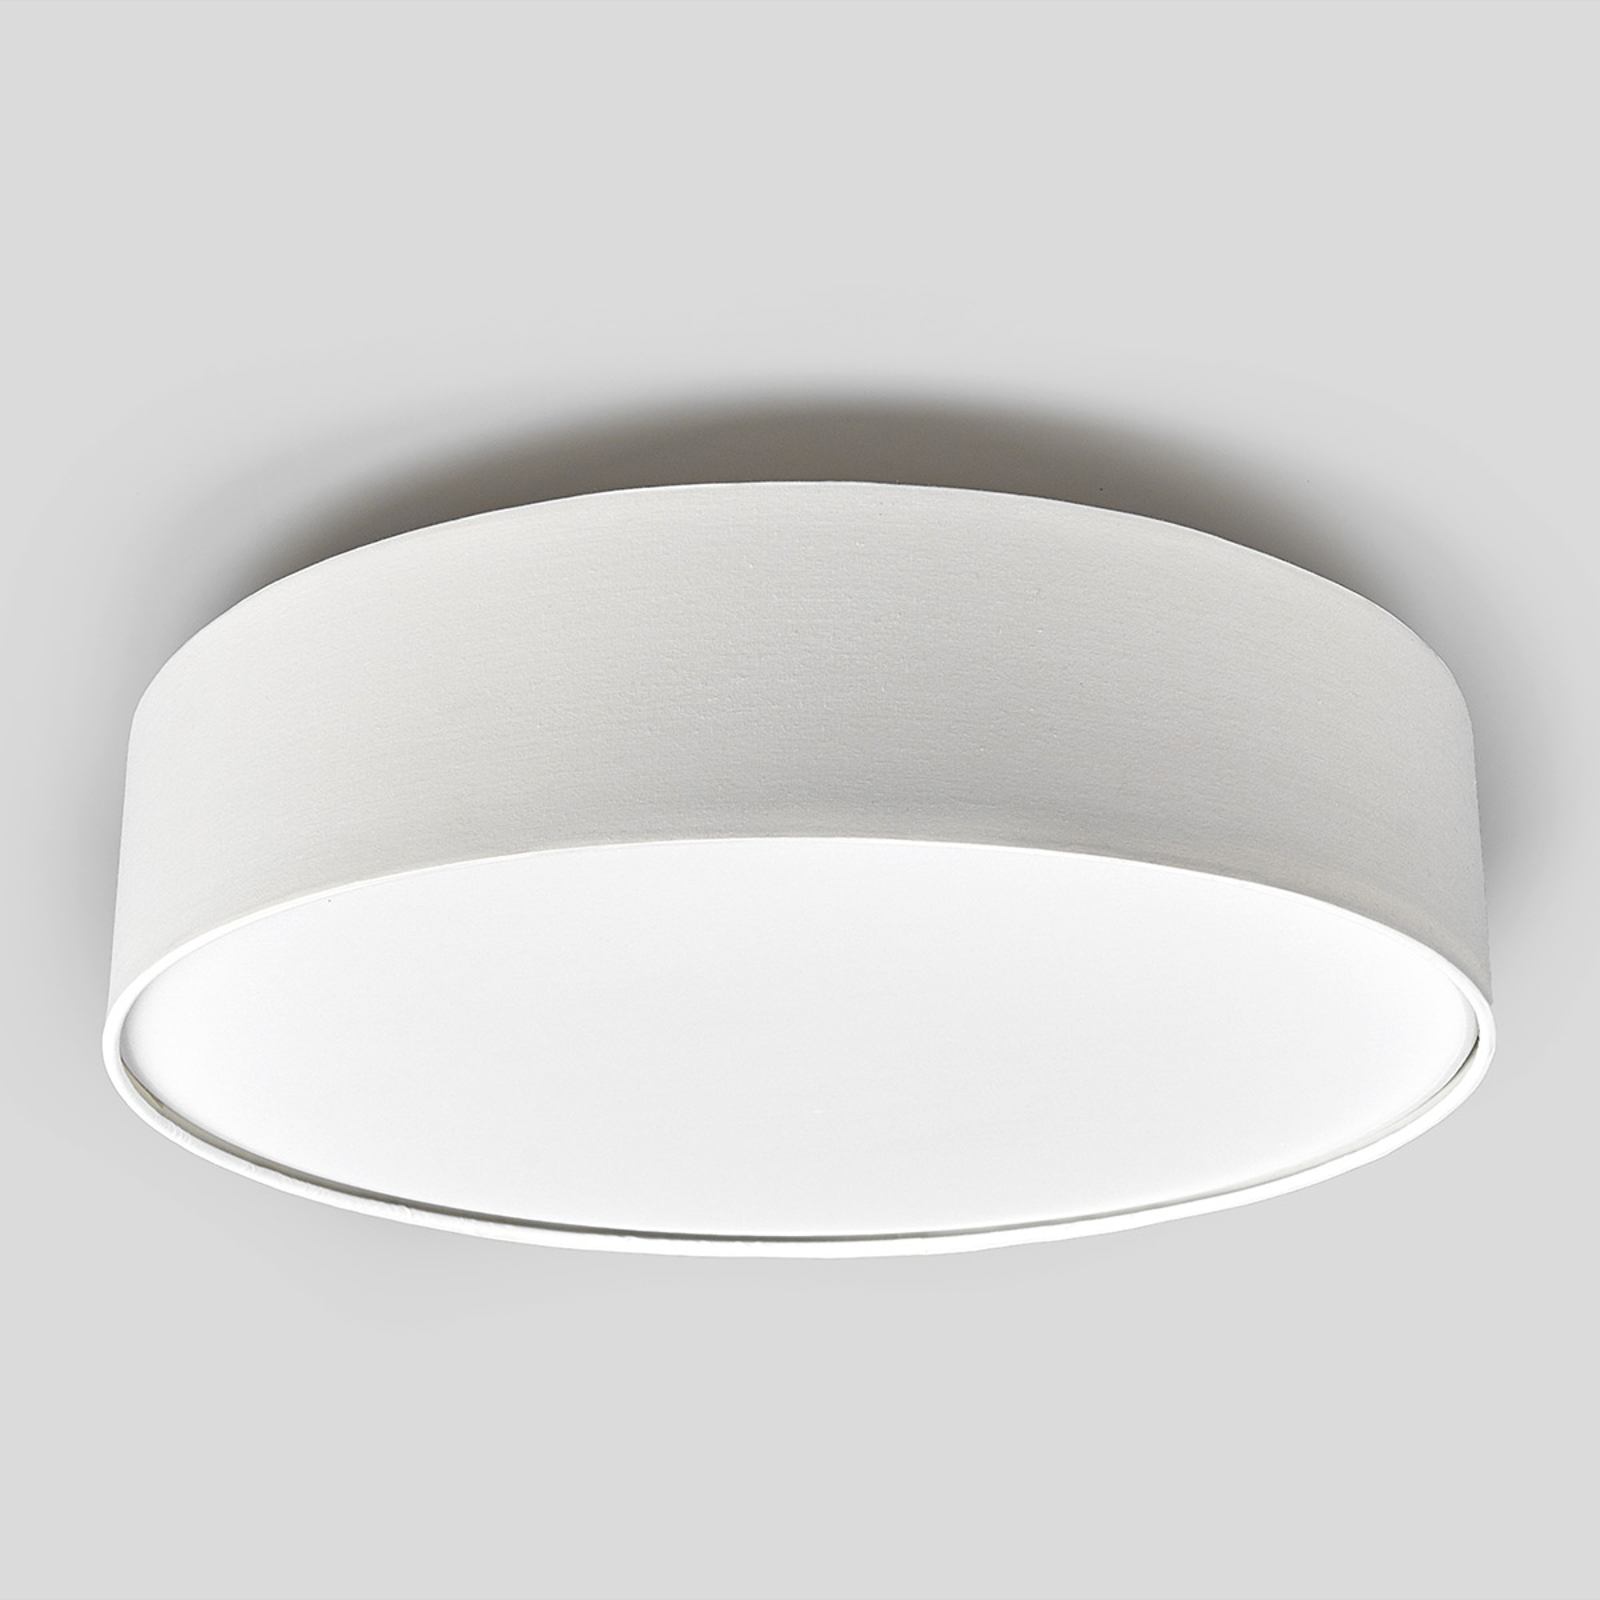 Kremowa lampa sufitowa LED SEBATIN z materiału